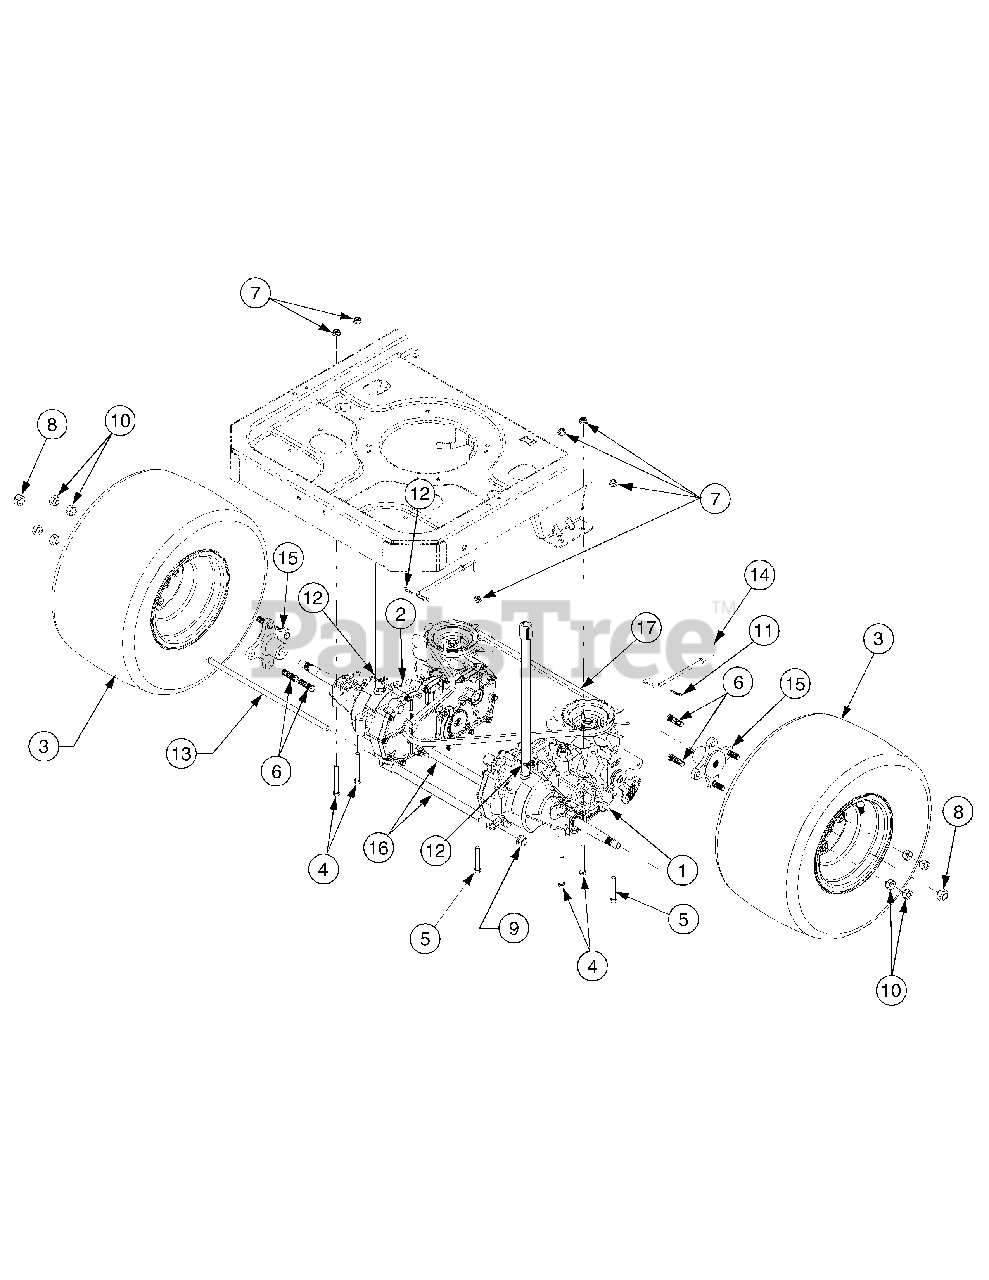 Diagram Wiring Diagram For 2006 Cub Cadet Rzt 50 Full Version Hd Quality Rzt 50 Sitexsears Filmarco It